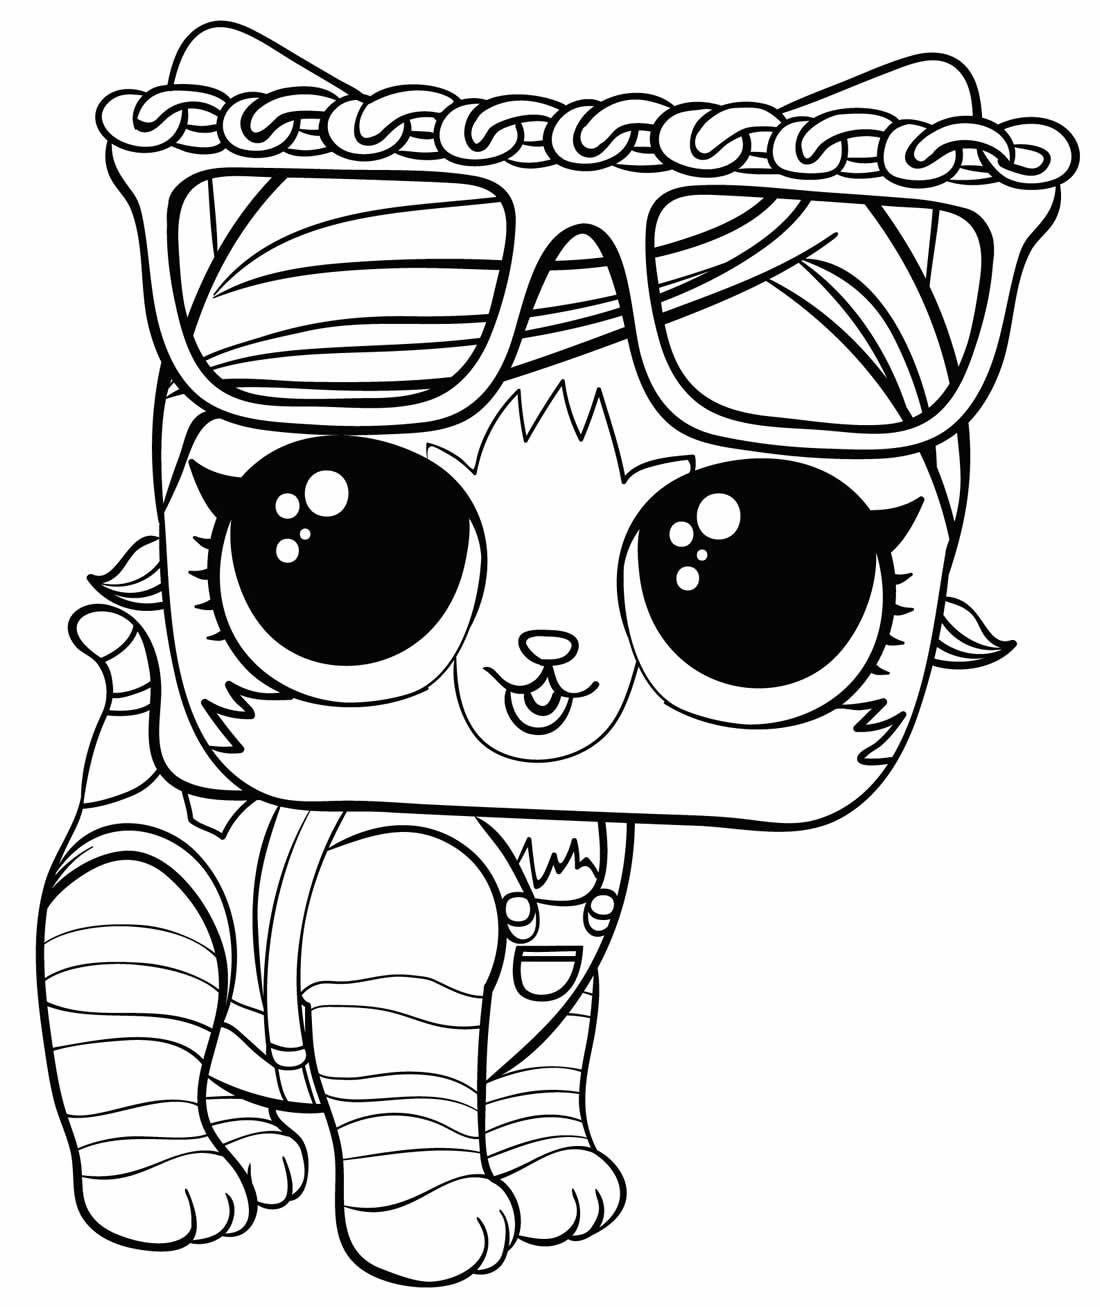 Imagem da Boneca LOL para pintar - Pet